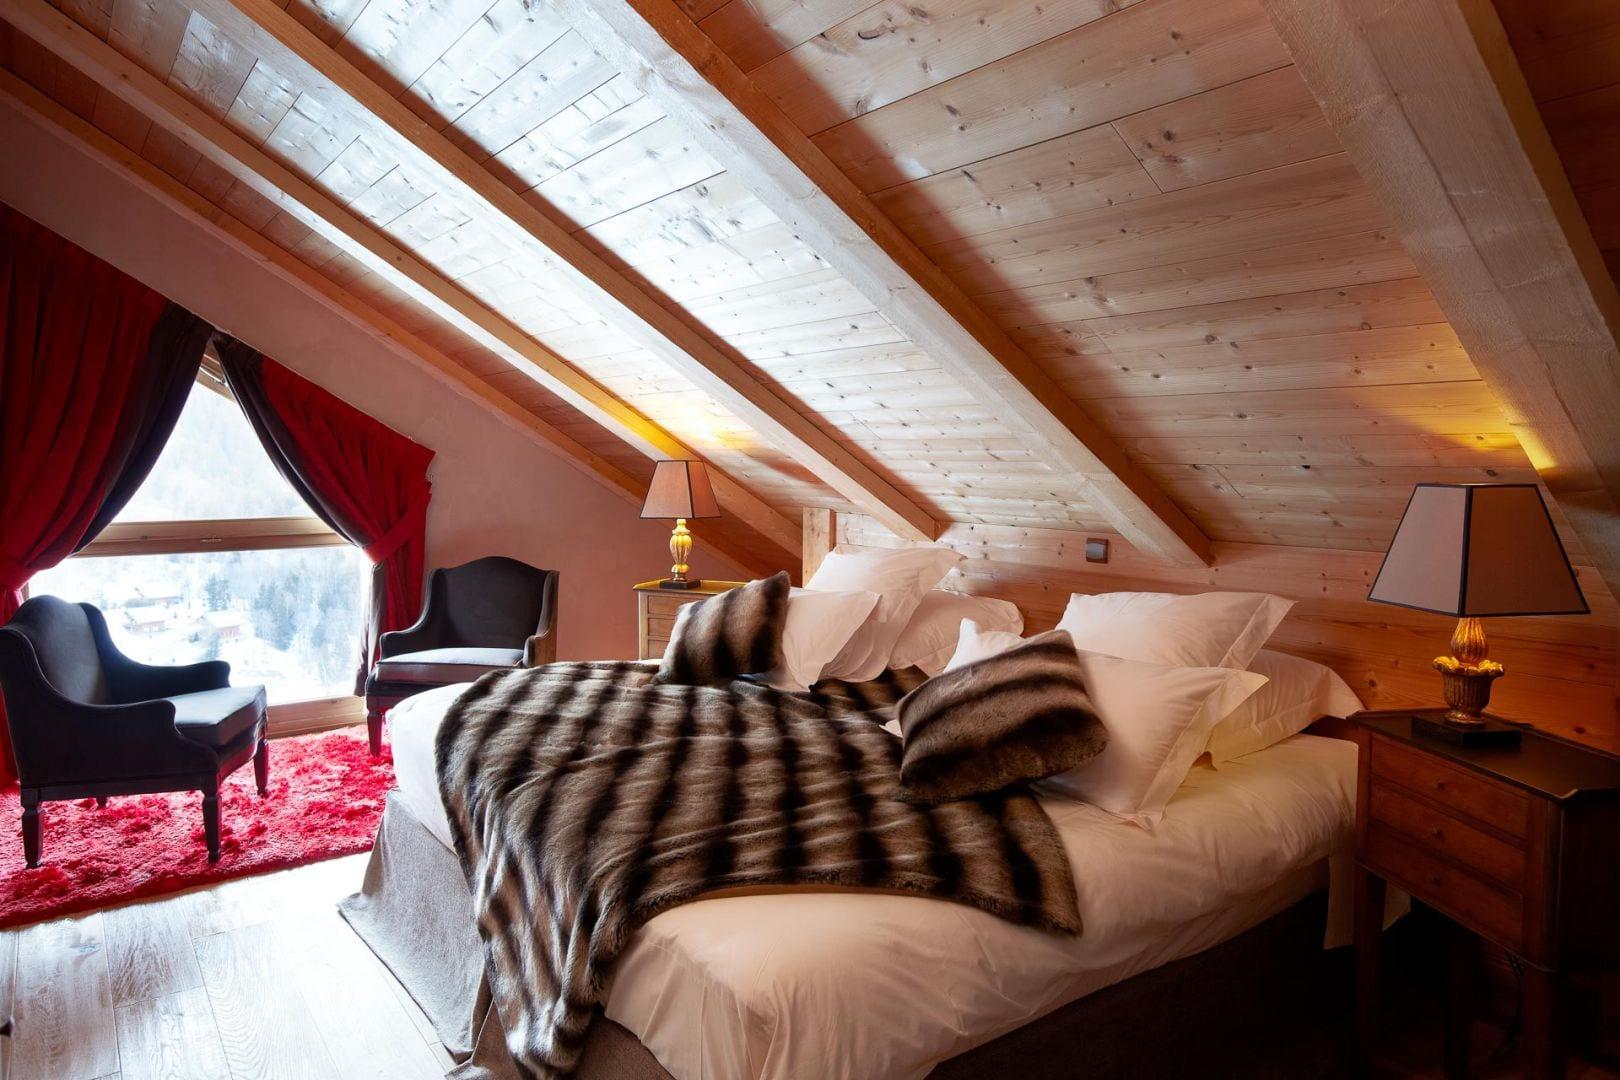 helios-hotel-meribel-28852-big